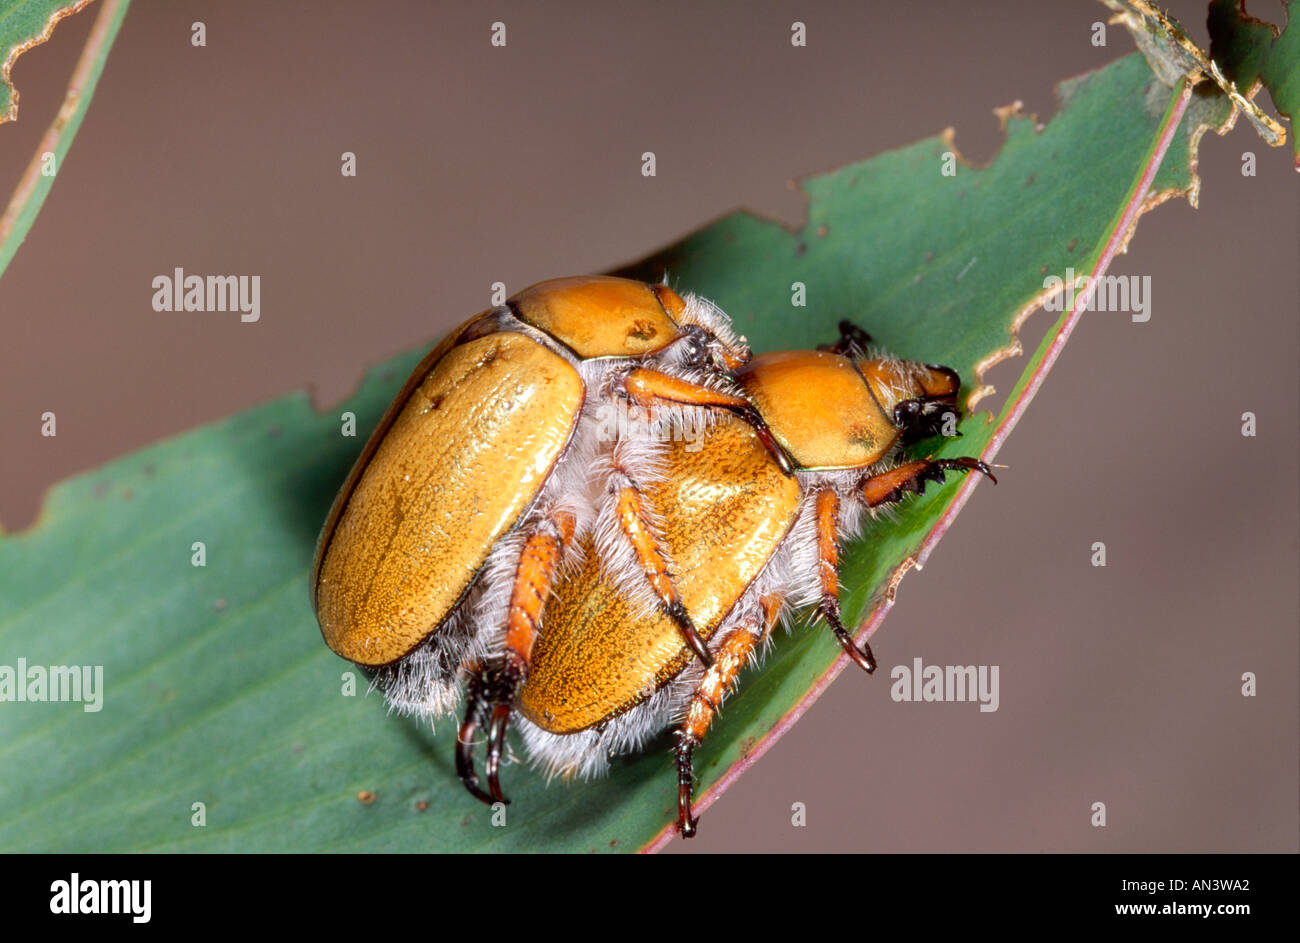 Australian Christmas Beetle.Mating Australian Christmas Beetles Stock Photo 5029281 Alamy